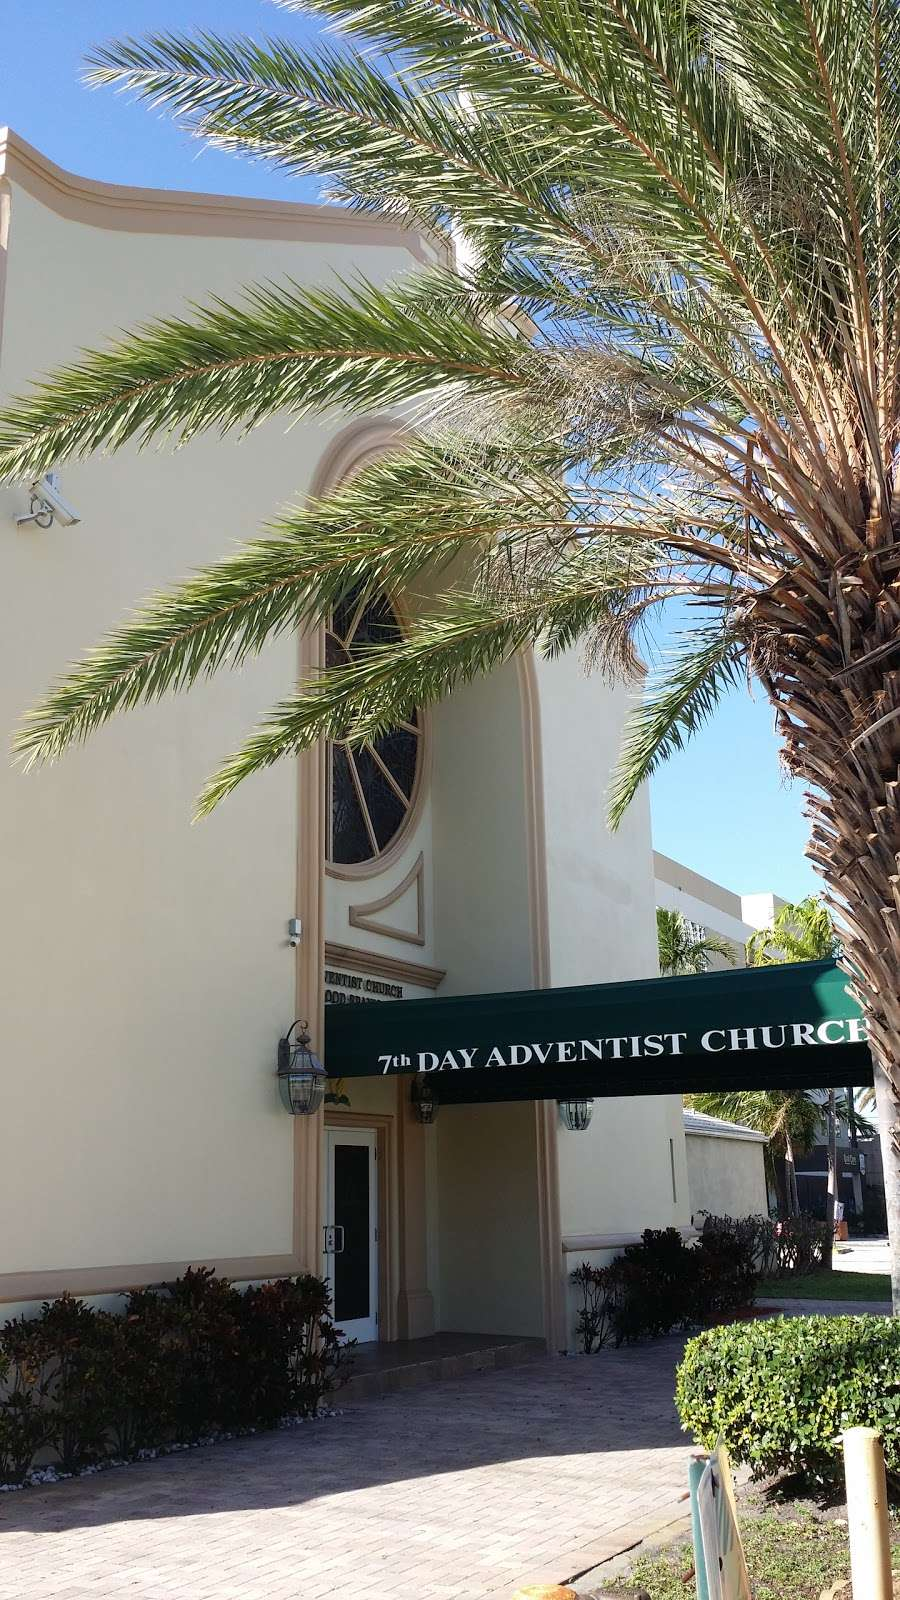 Hollywood Spanish Seventh-day Adventist Church - church    Photo 6 of 10   Address: 1808 Van Buren St, Hollywood, FL 33020, USA